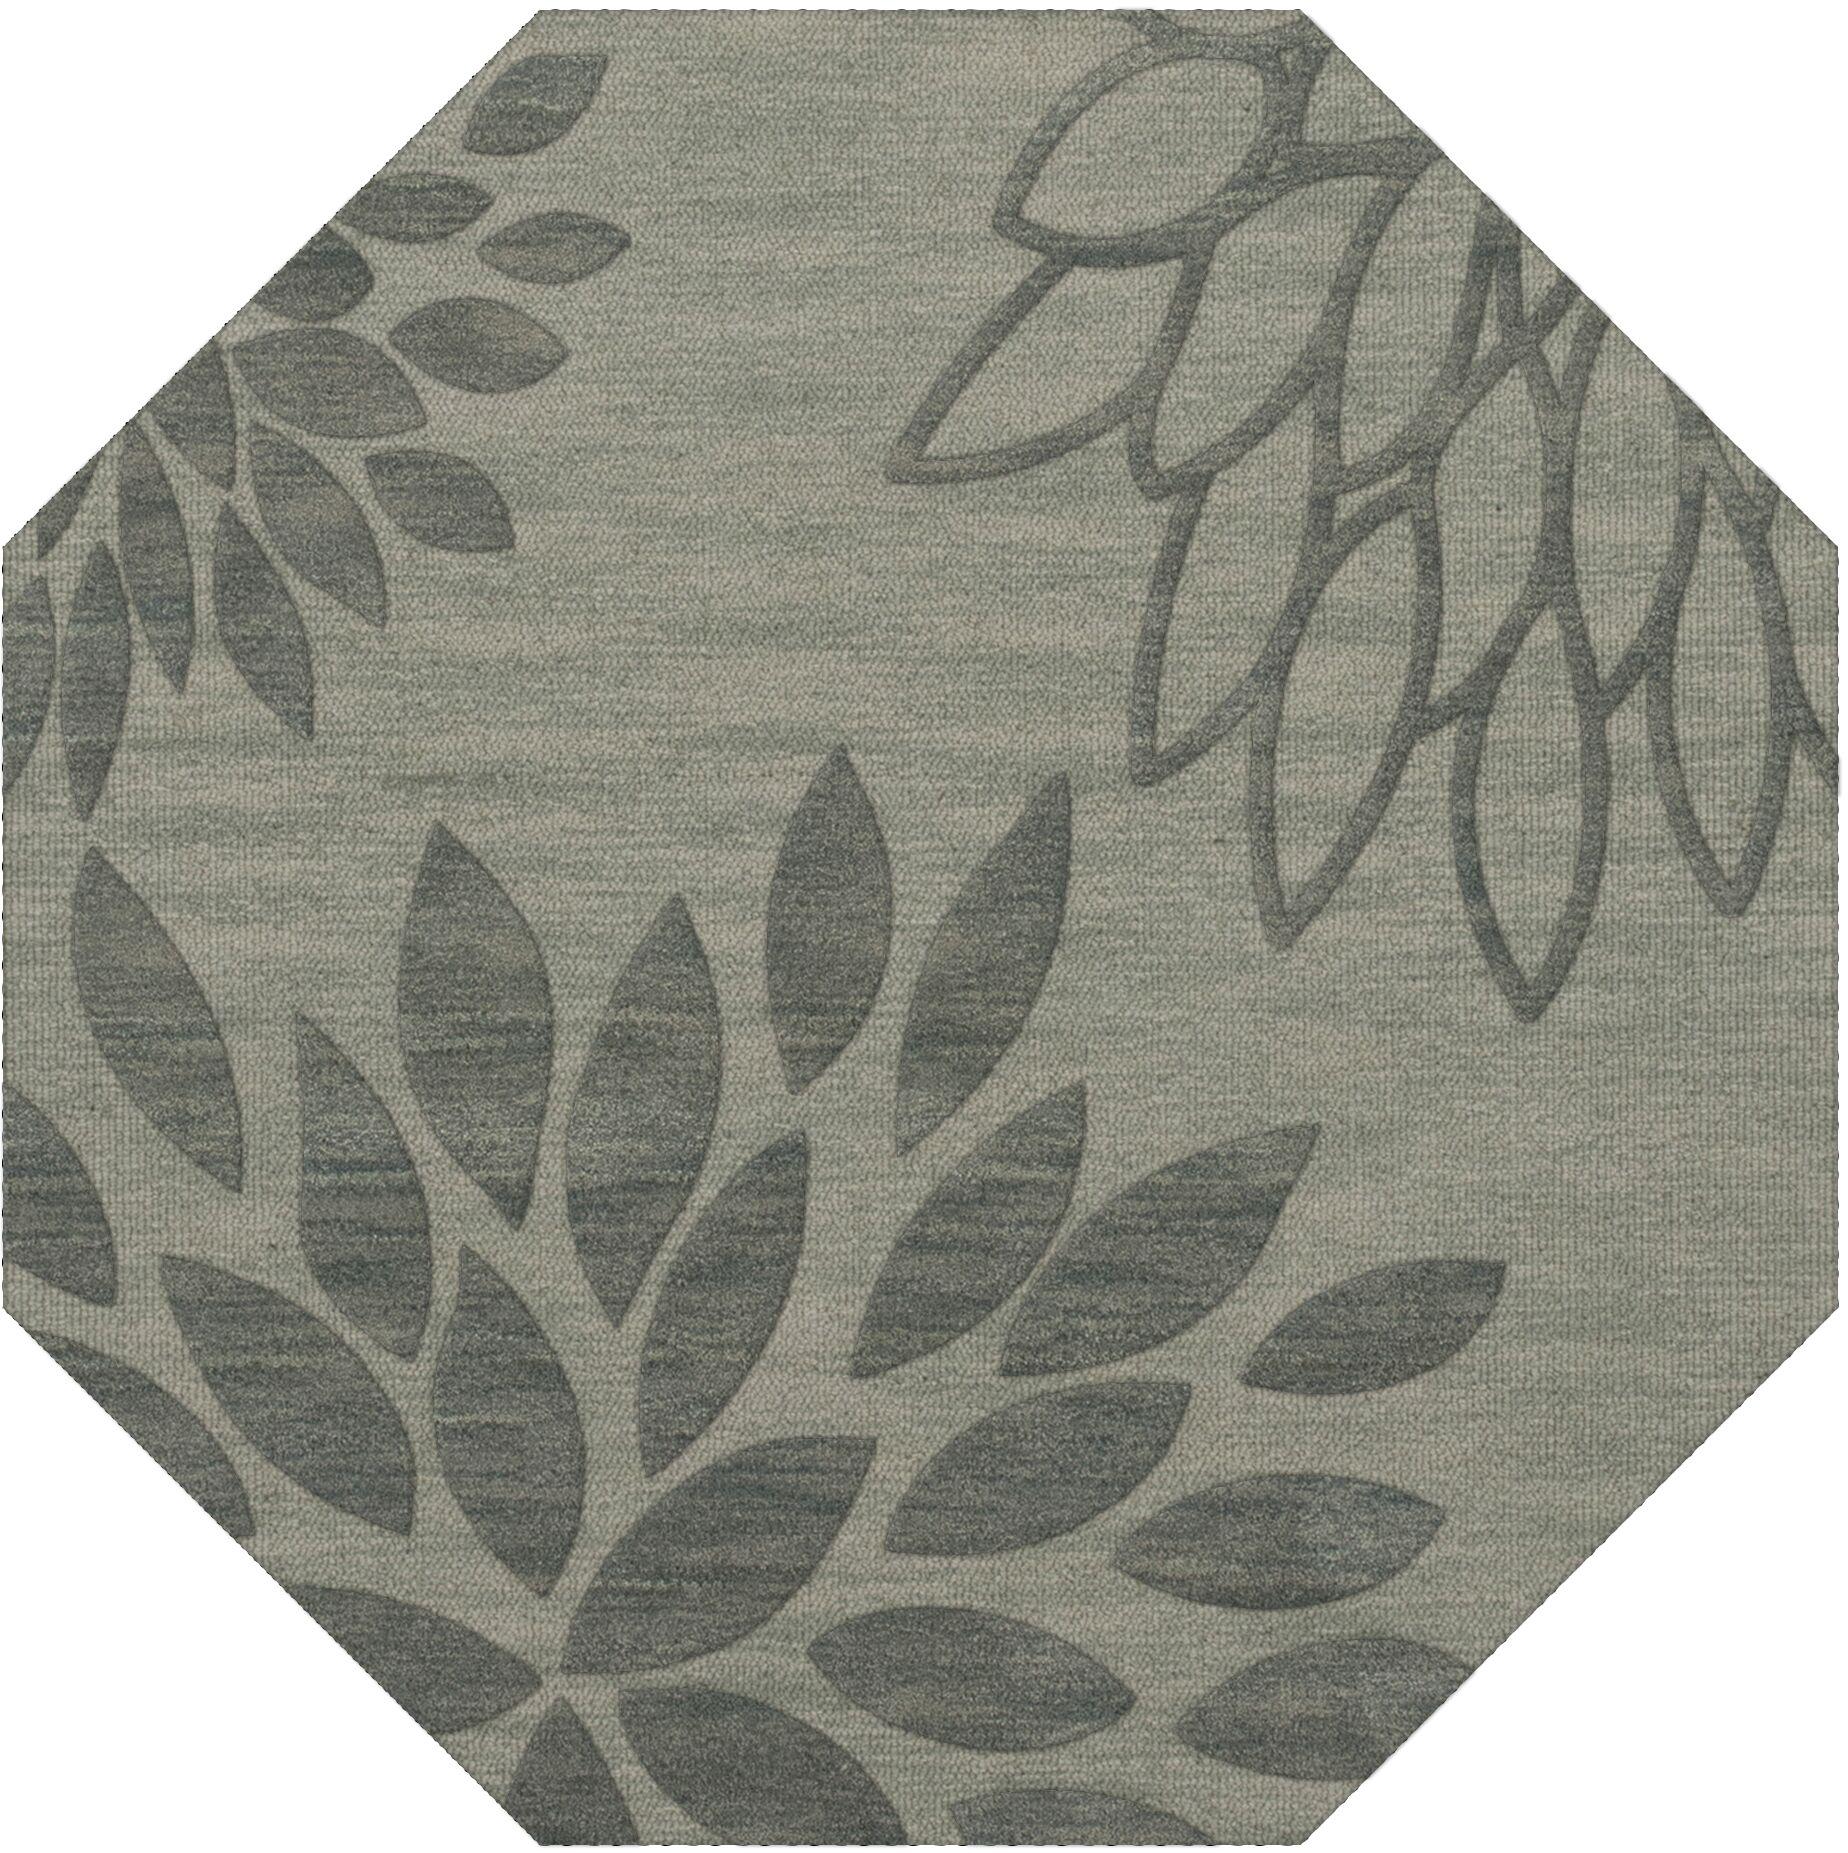 Bao Spa Area Rug Rug Size: Octagon 12'